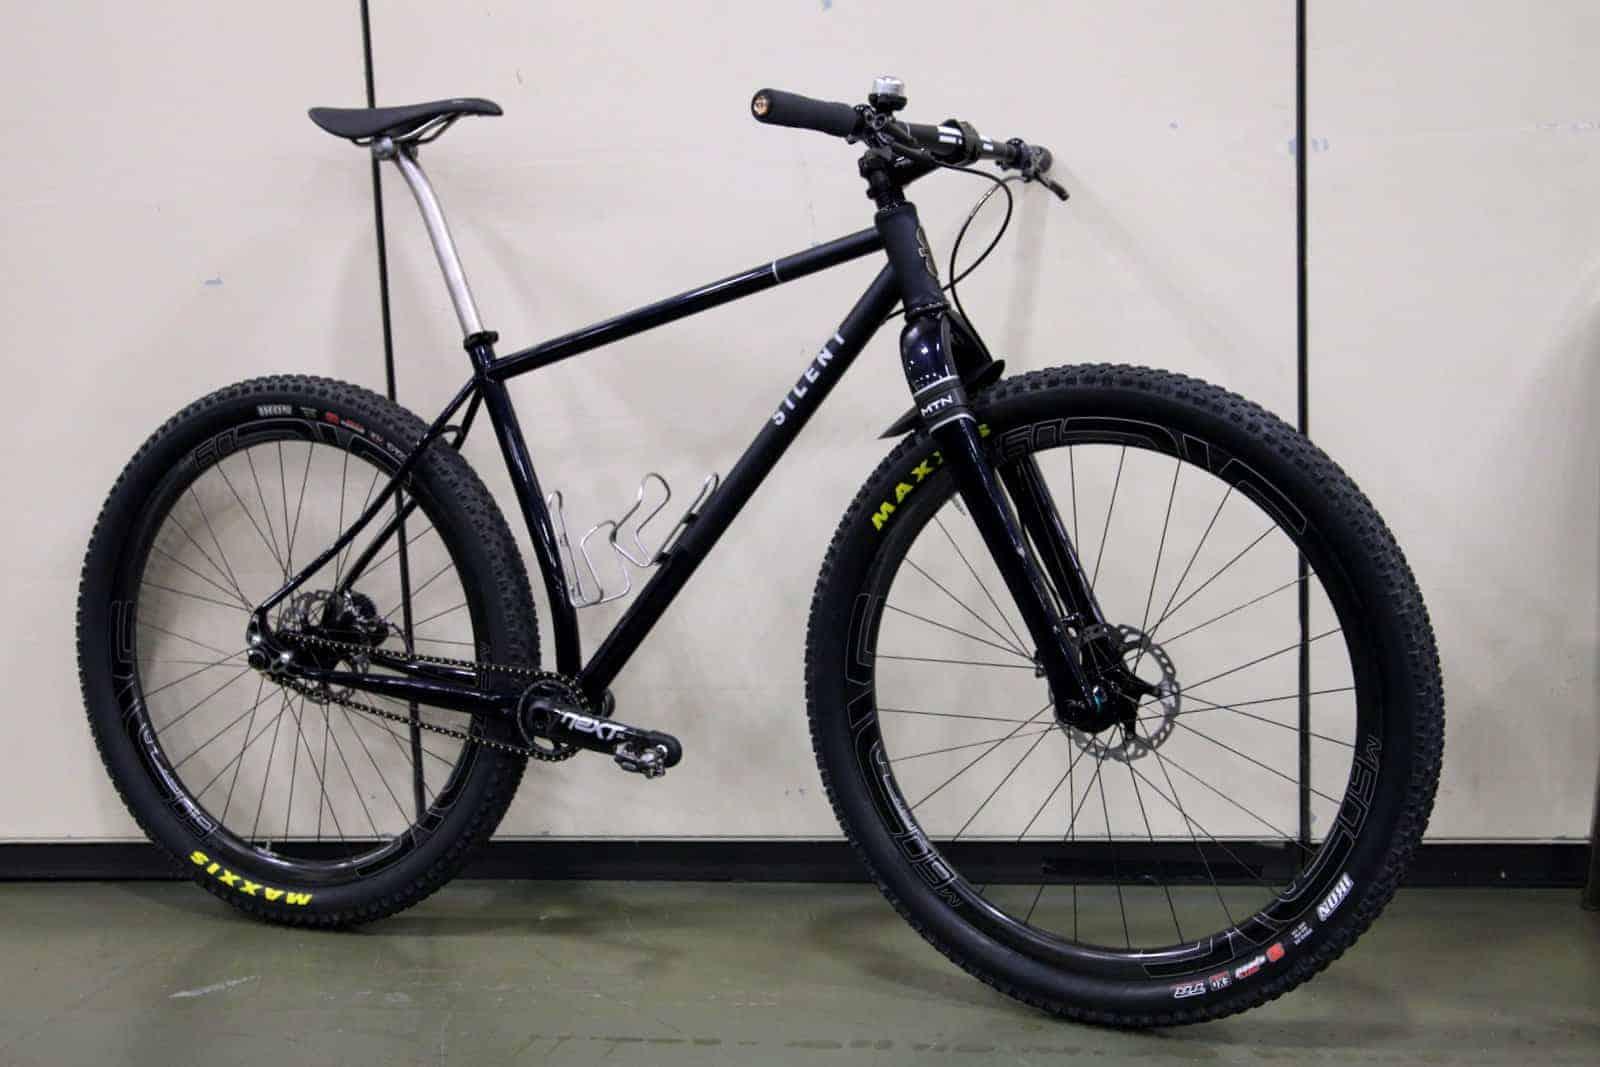 2015 Nahbs Silent Cycles 29er Rigid Mountain Bike